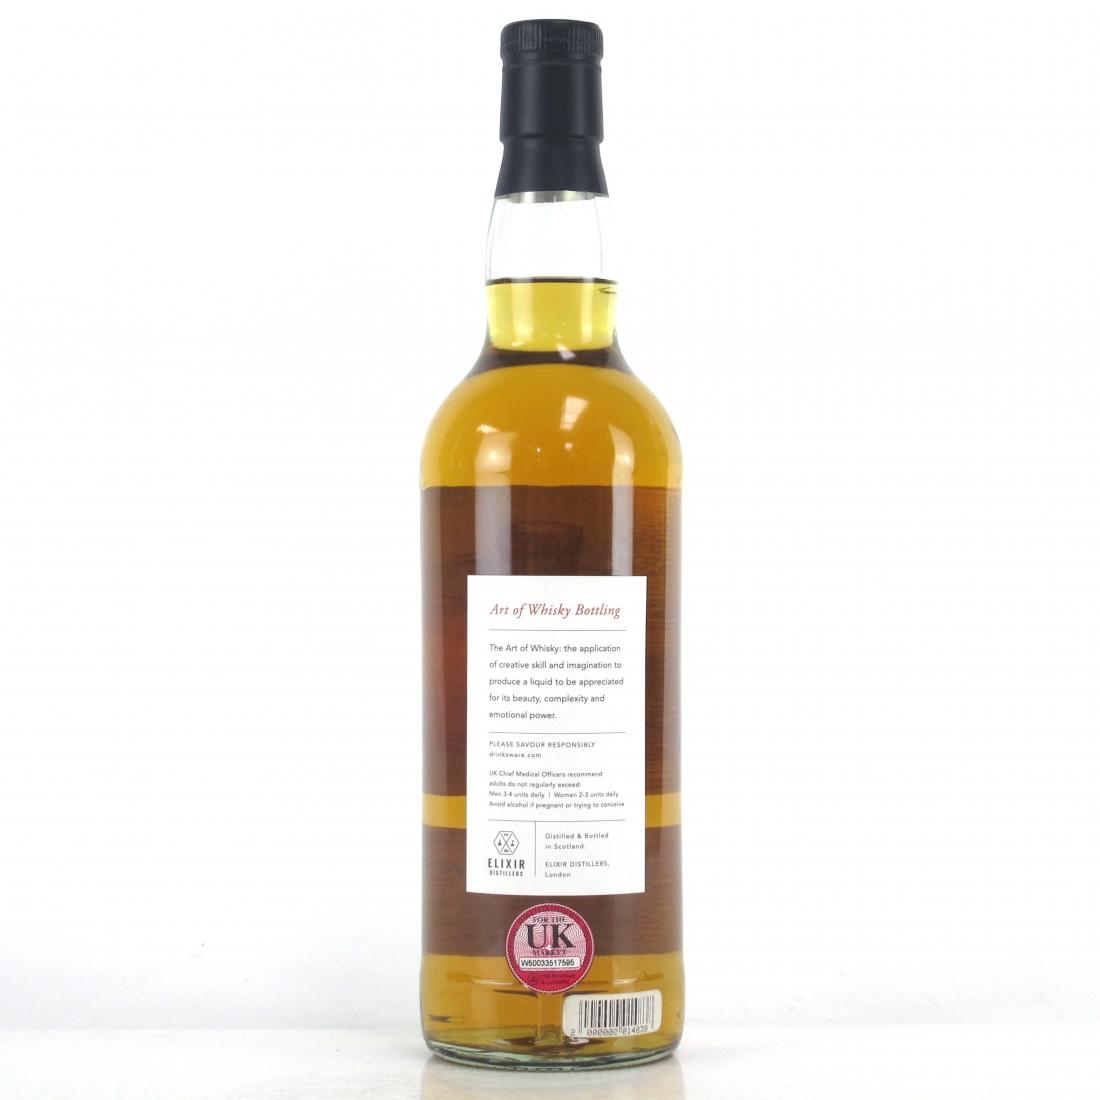 Springbank Elixir Distillers 24 Year Old / Art of Whisky